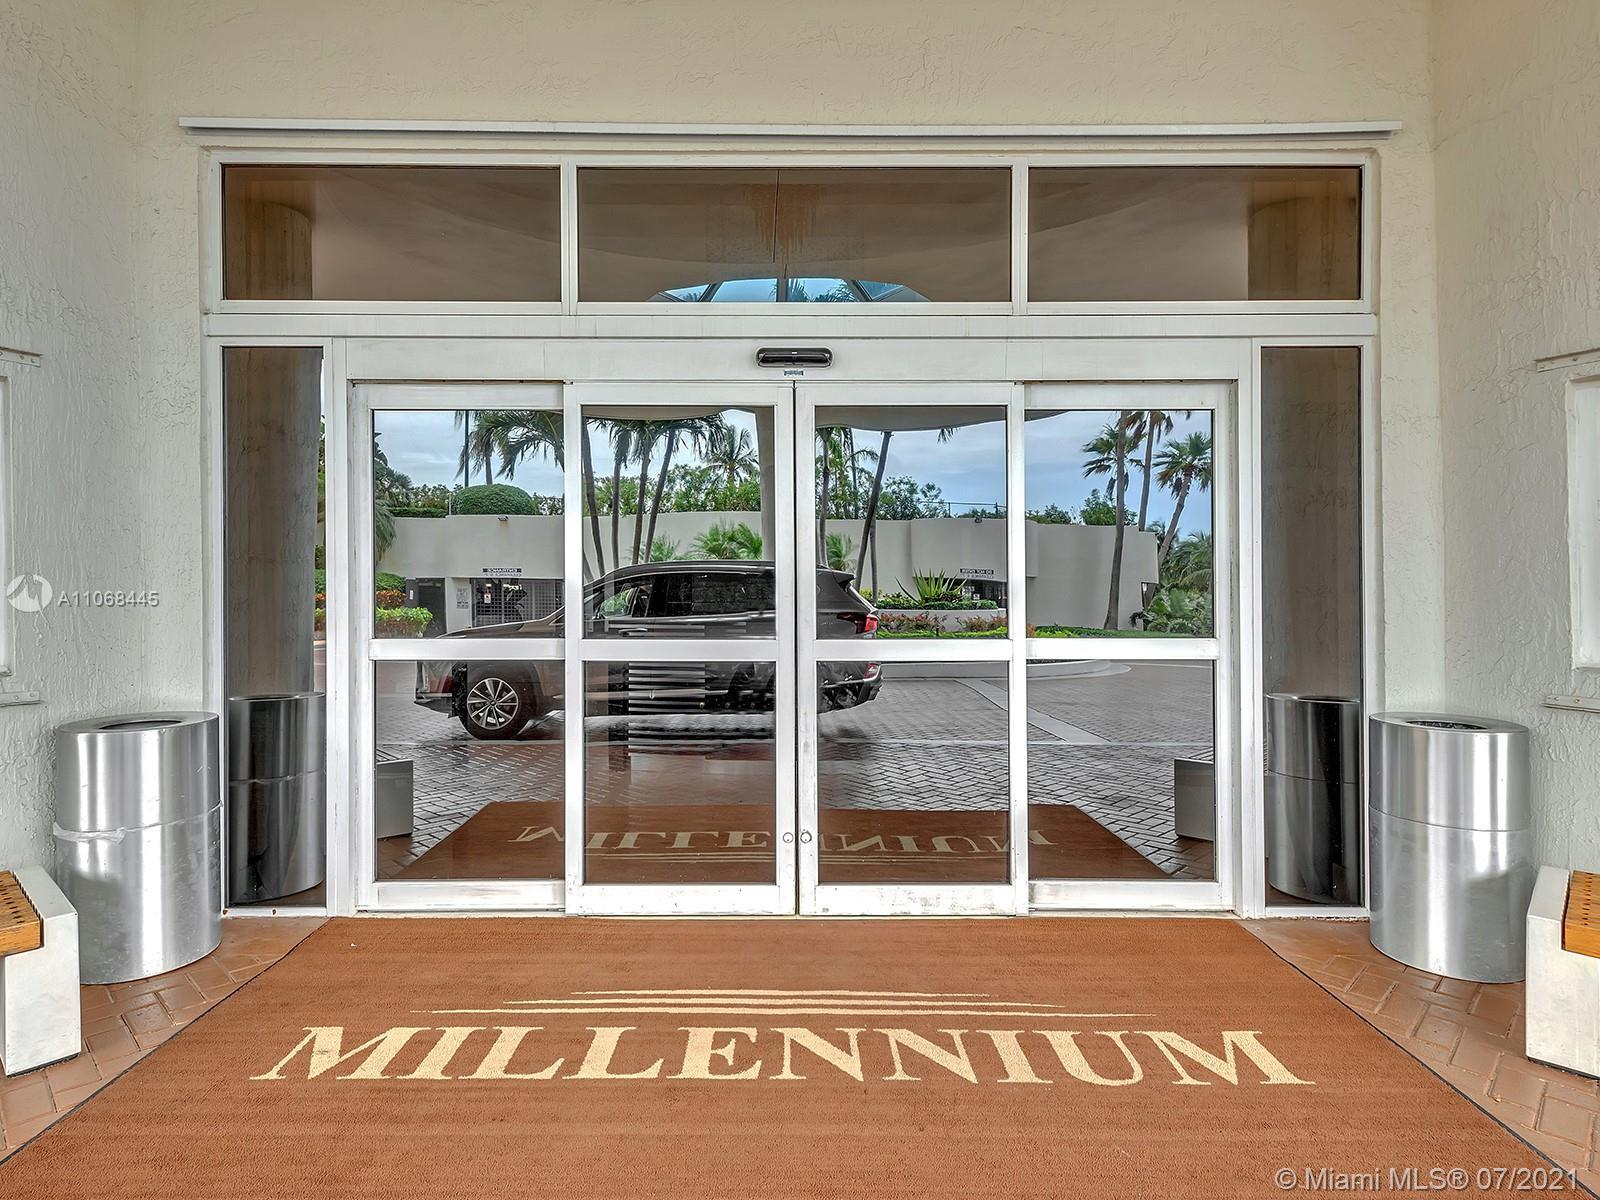 Millennium - Квартиры на продажу